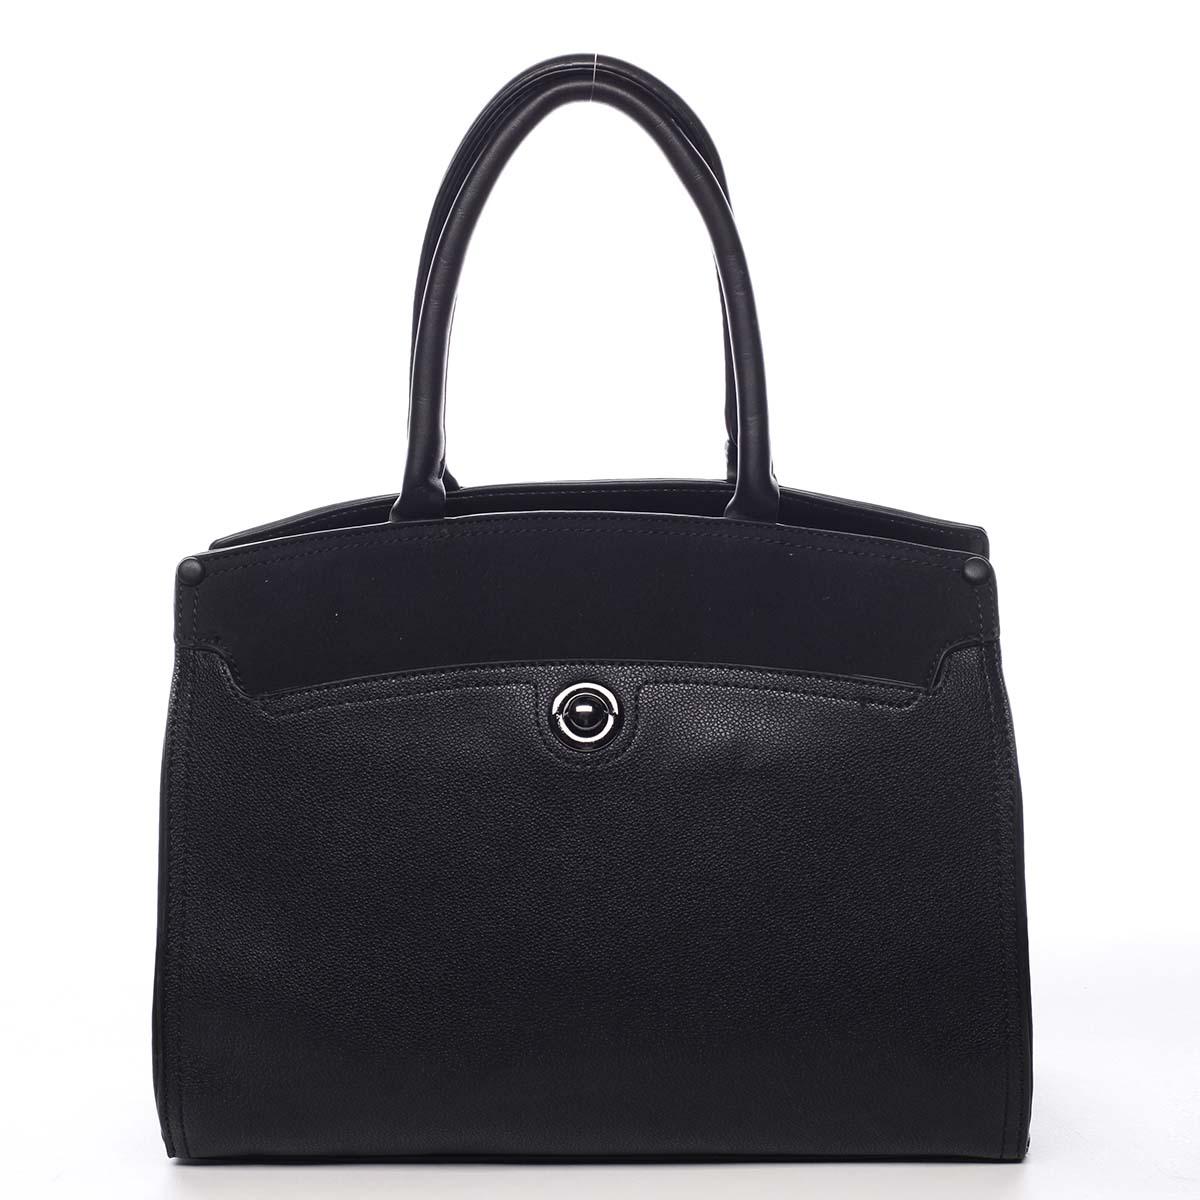 Dámska kabelka do ruky čierna - Maria C Toxic čierna